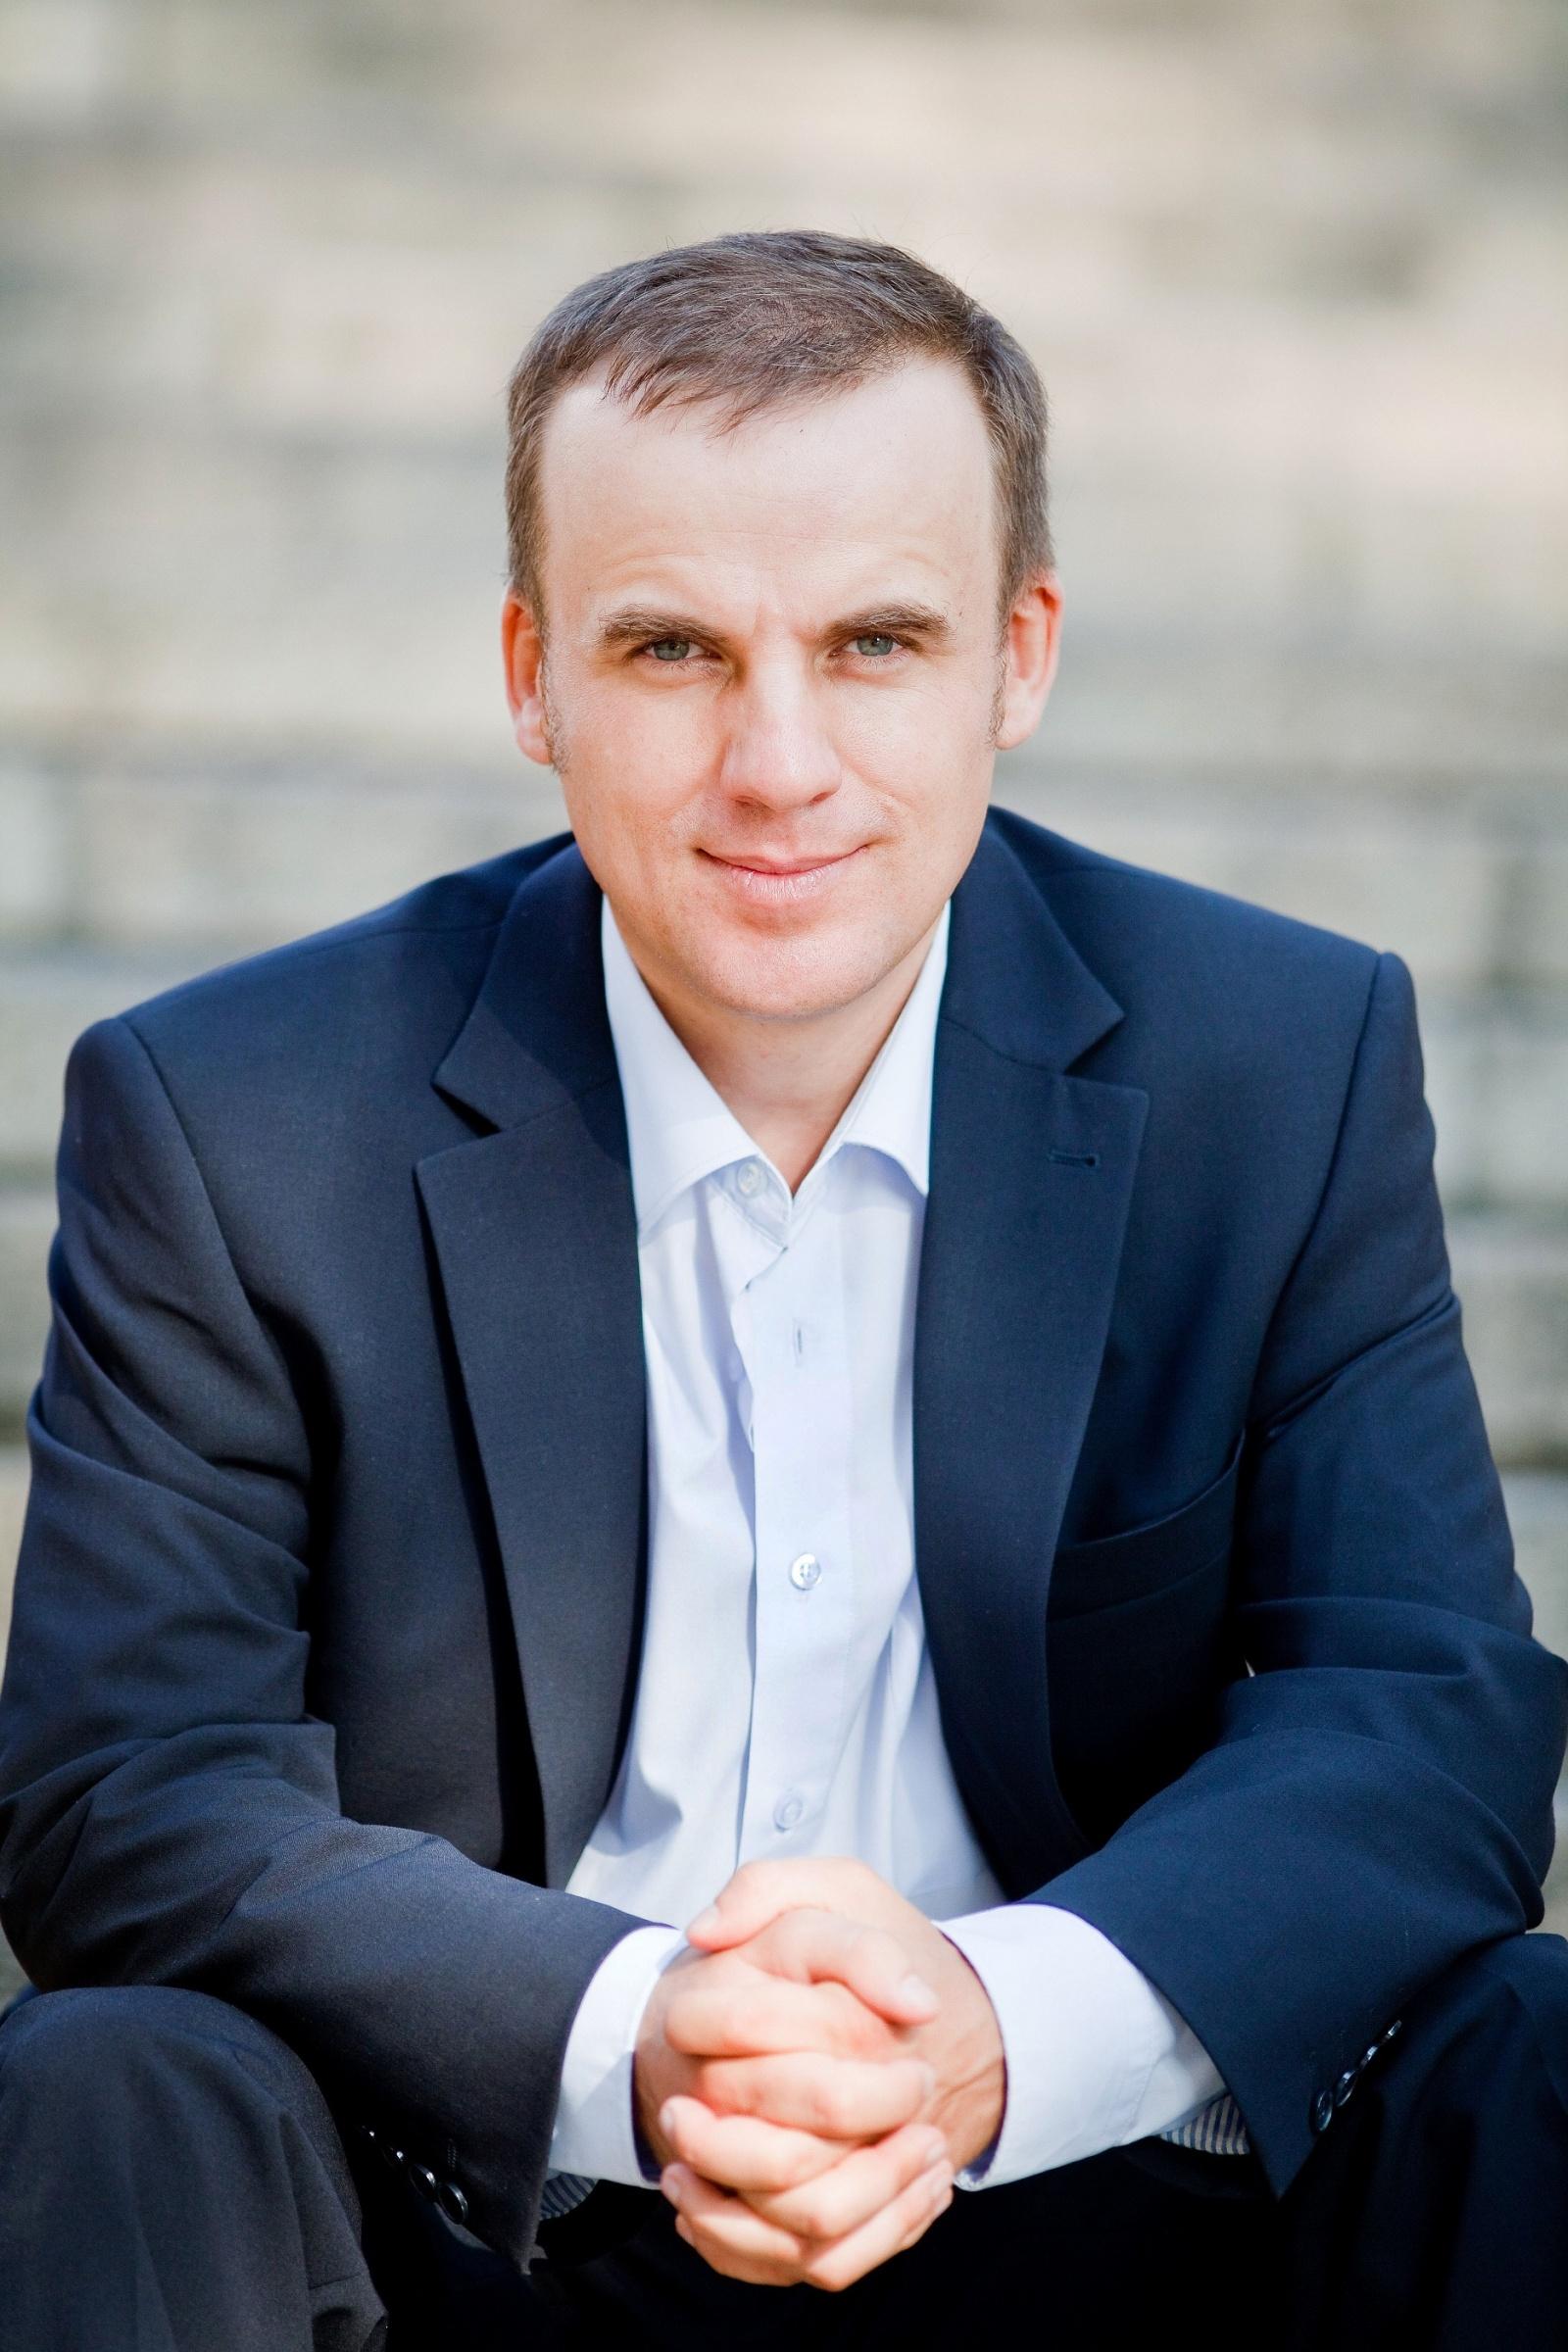 «Ни слова о Snapchat»: Виктор Шабуров — о своих проектах, спортивном программировании и трендах ИТ- бизнеса - 2